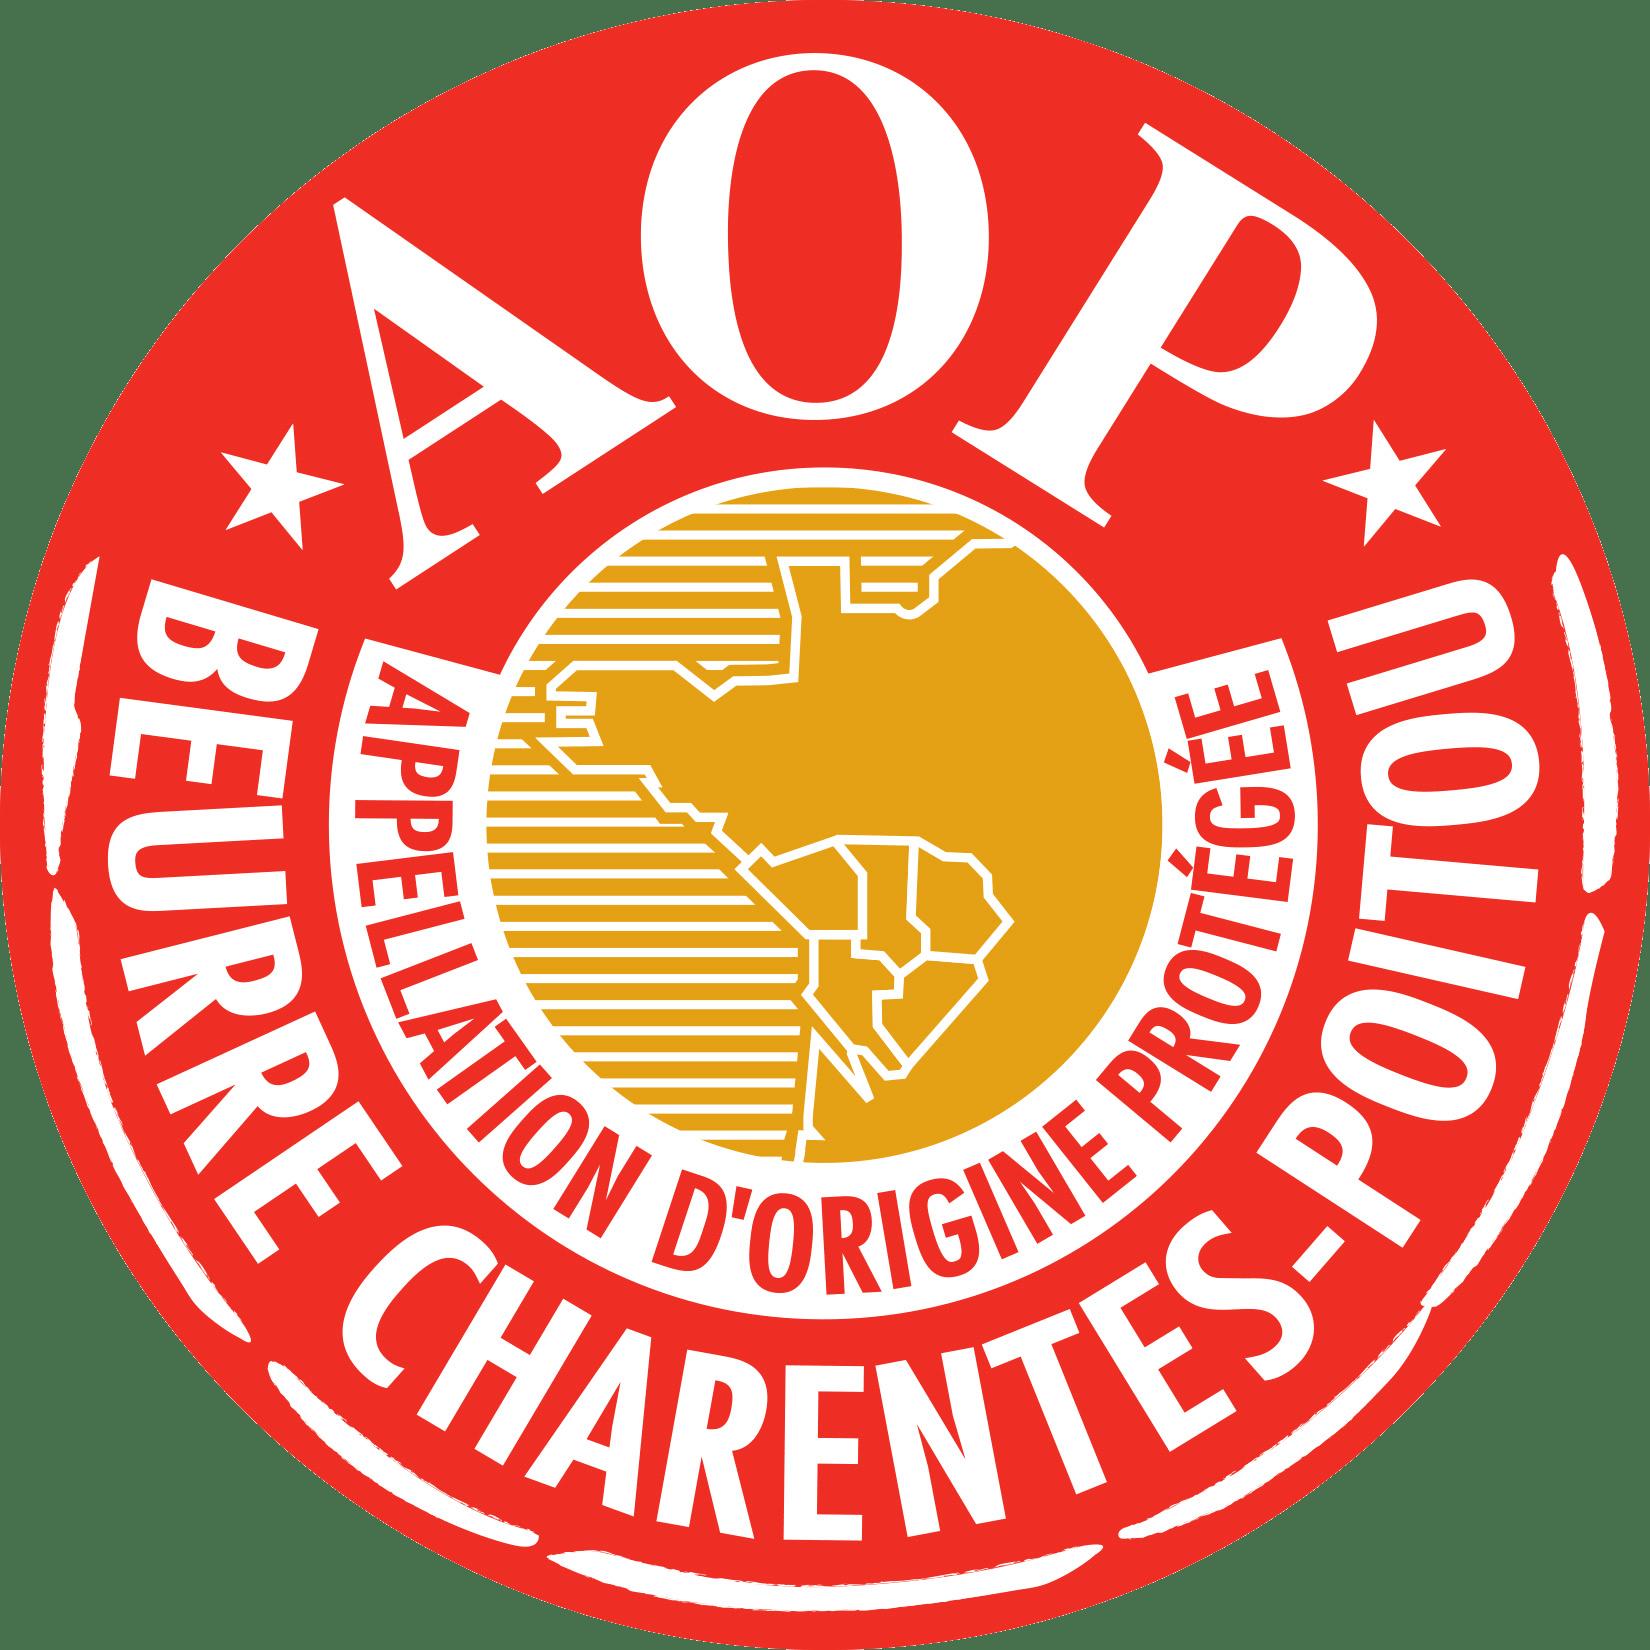 AOP beurre Charentes-Poitou